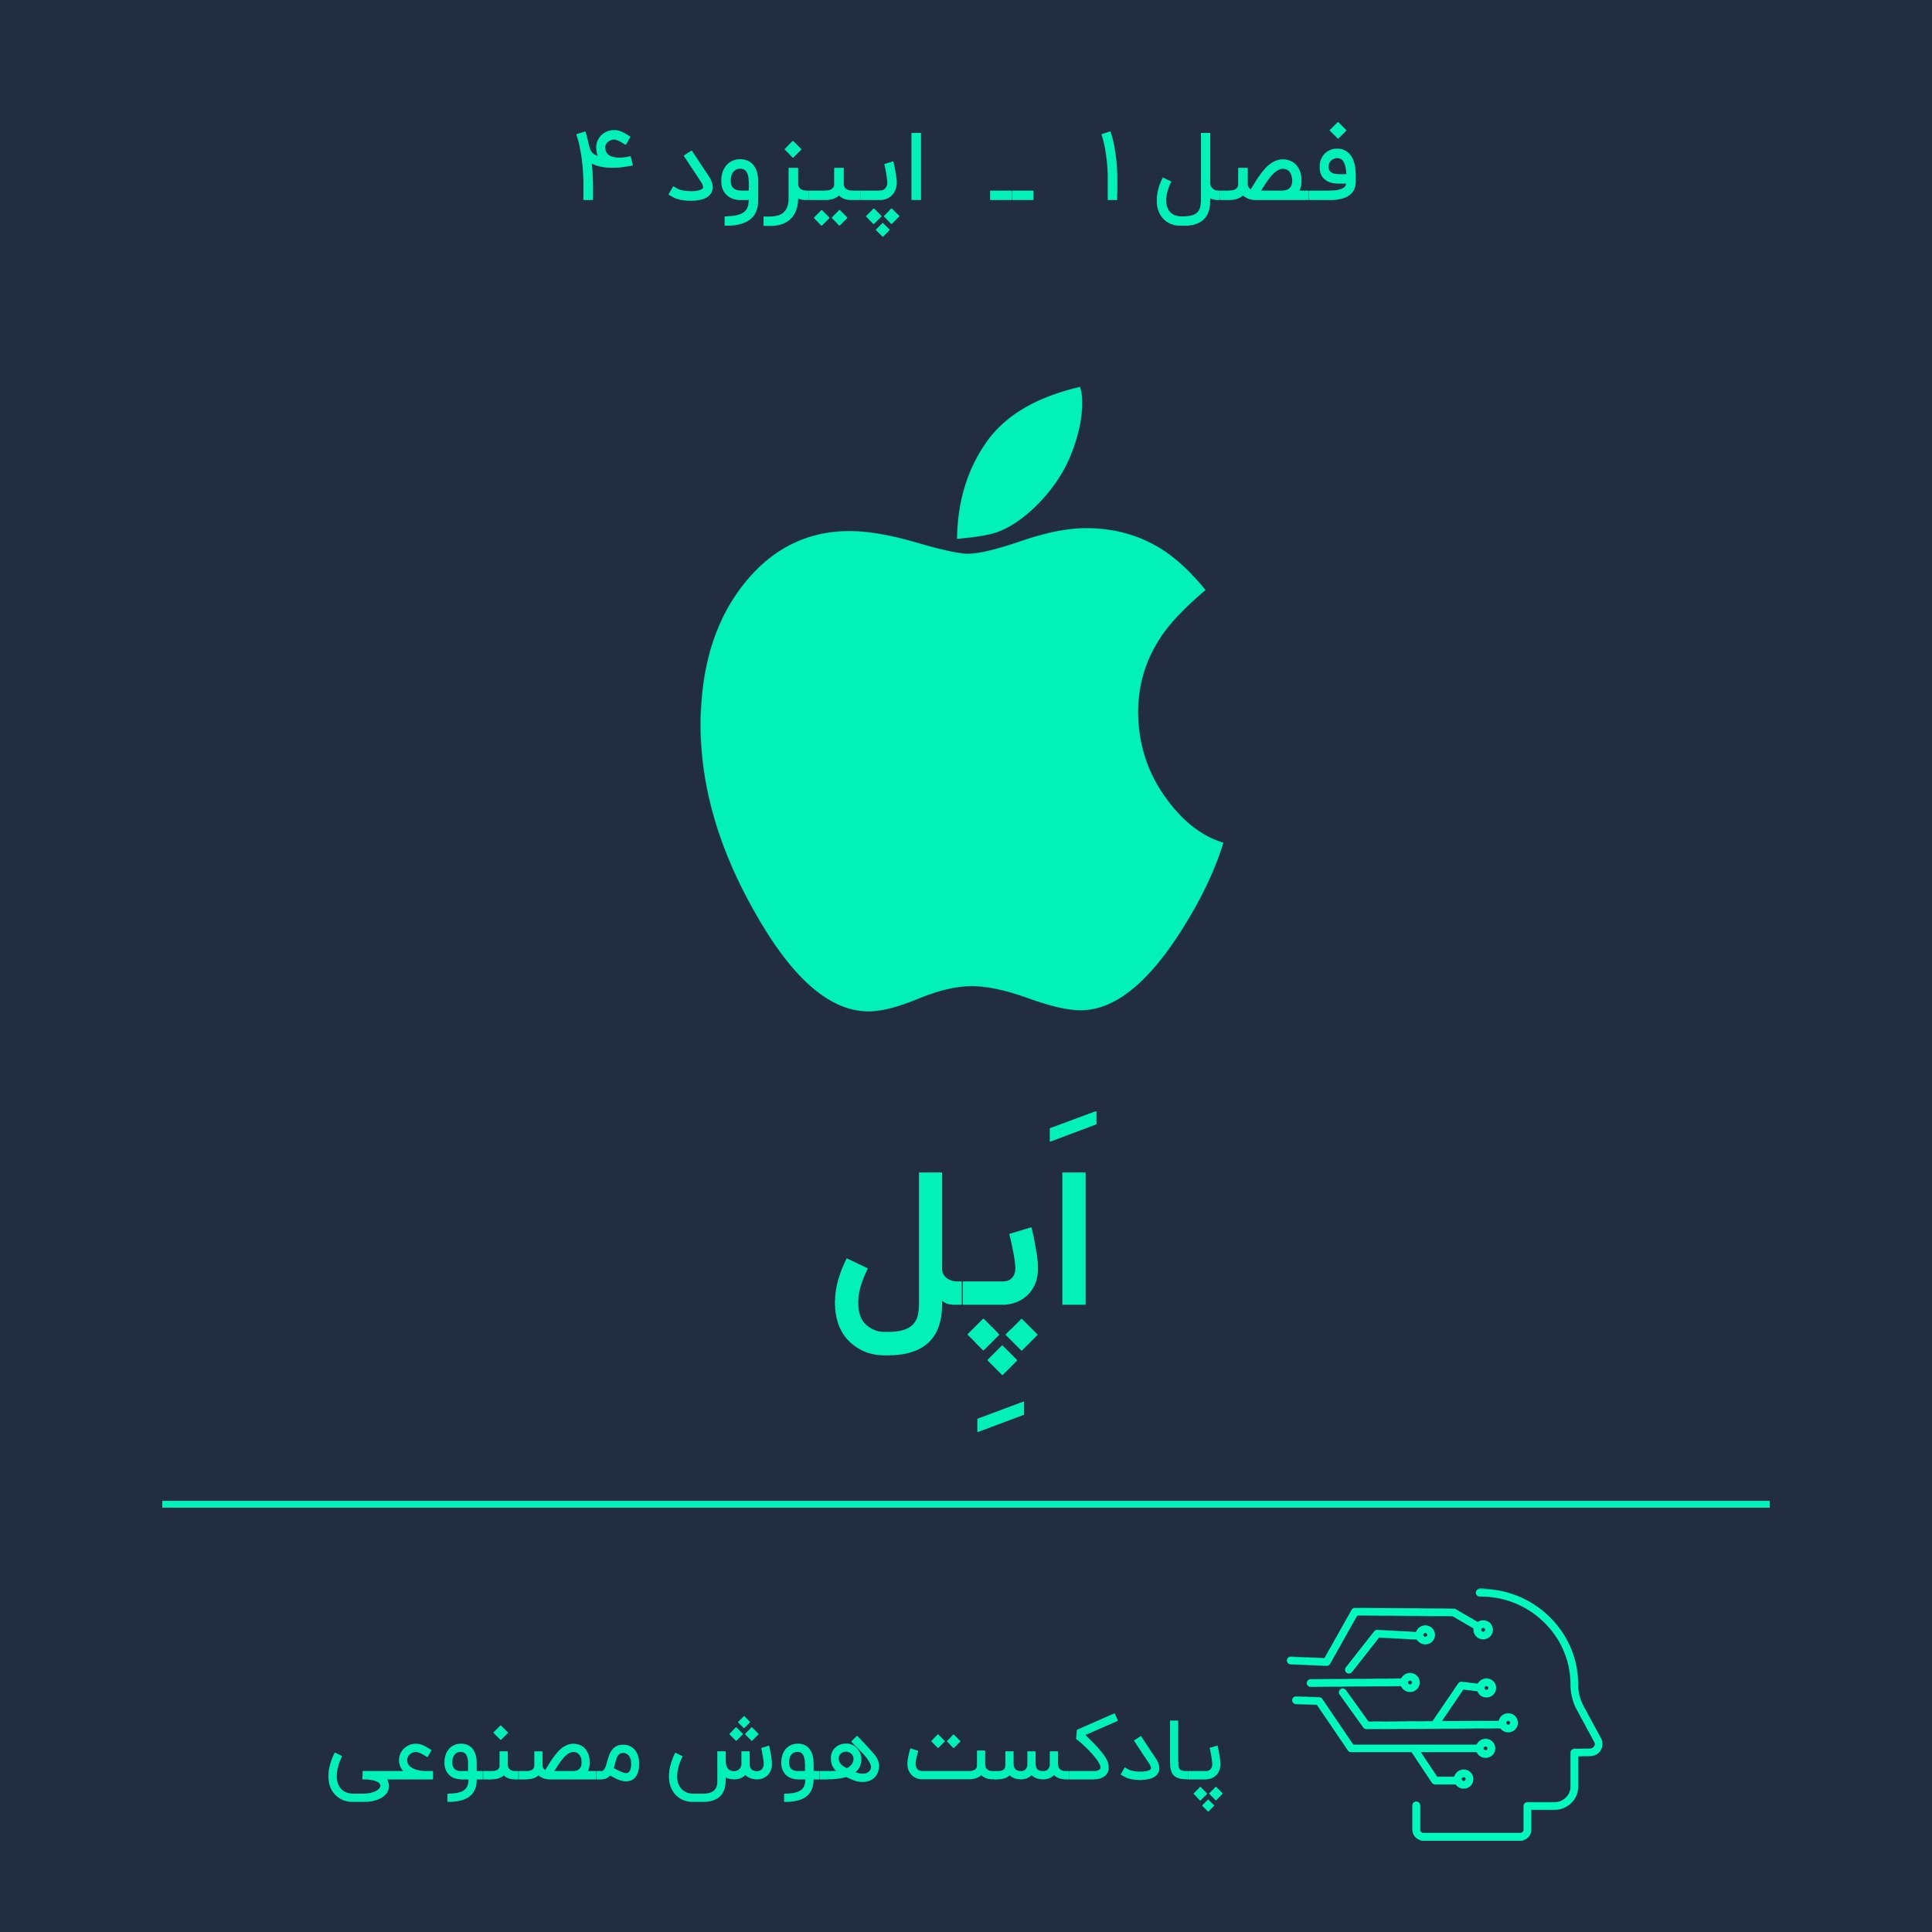 هوش مصنوعی در کسب و کار — بخش چهارم: اپل